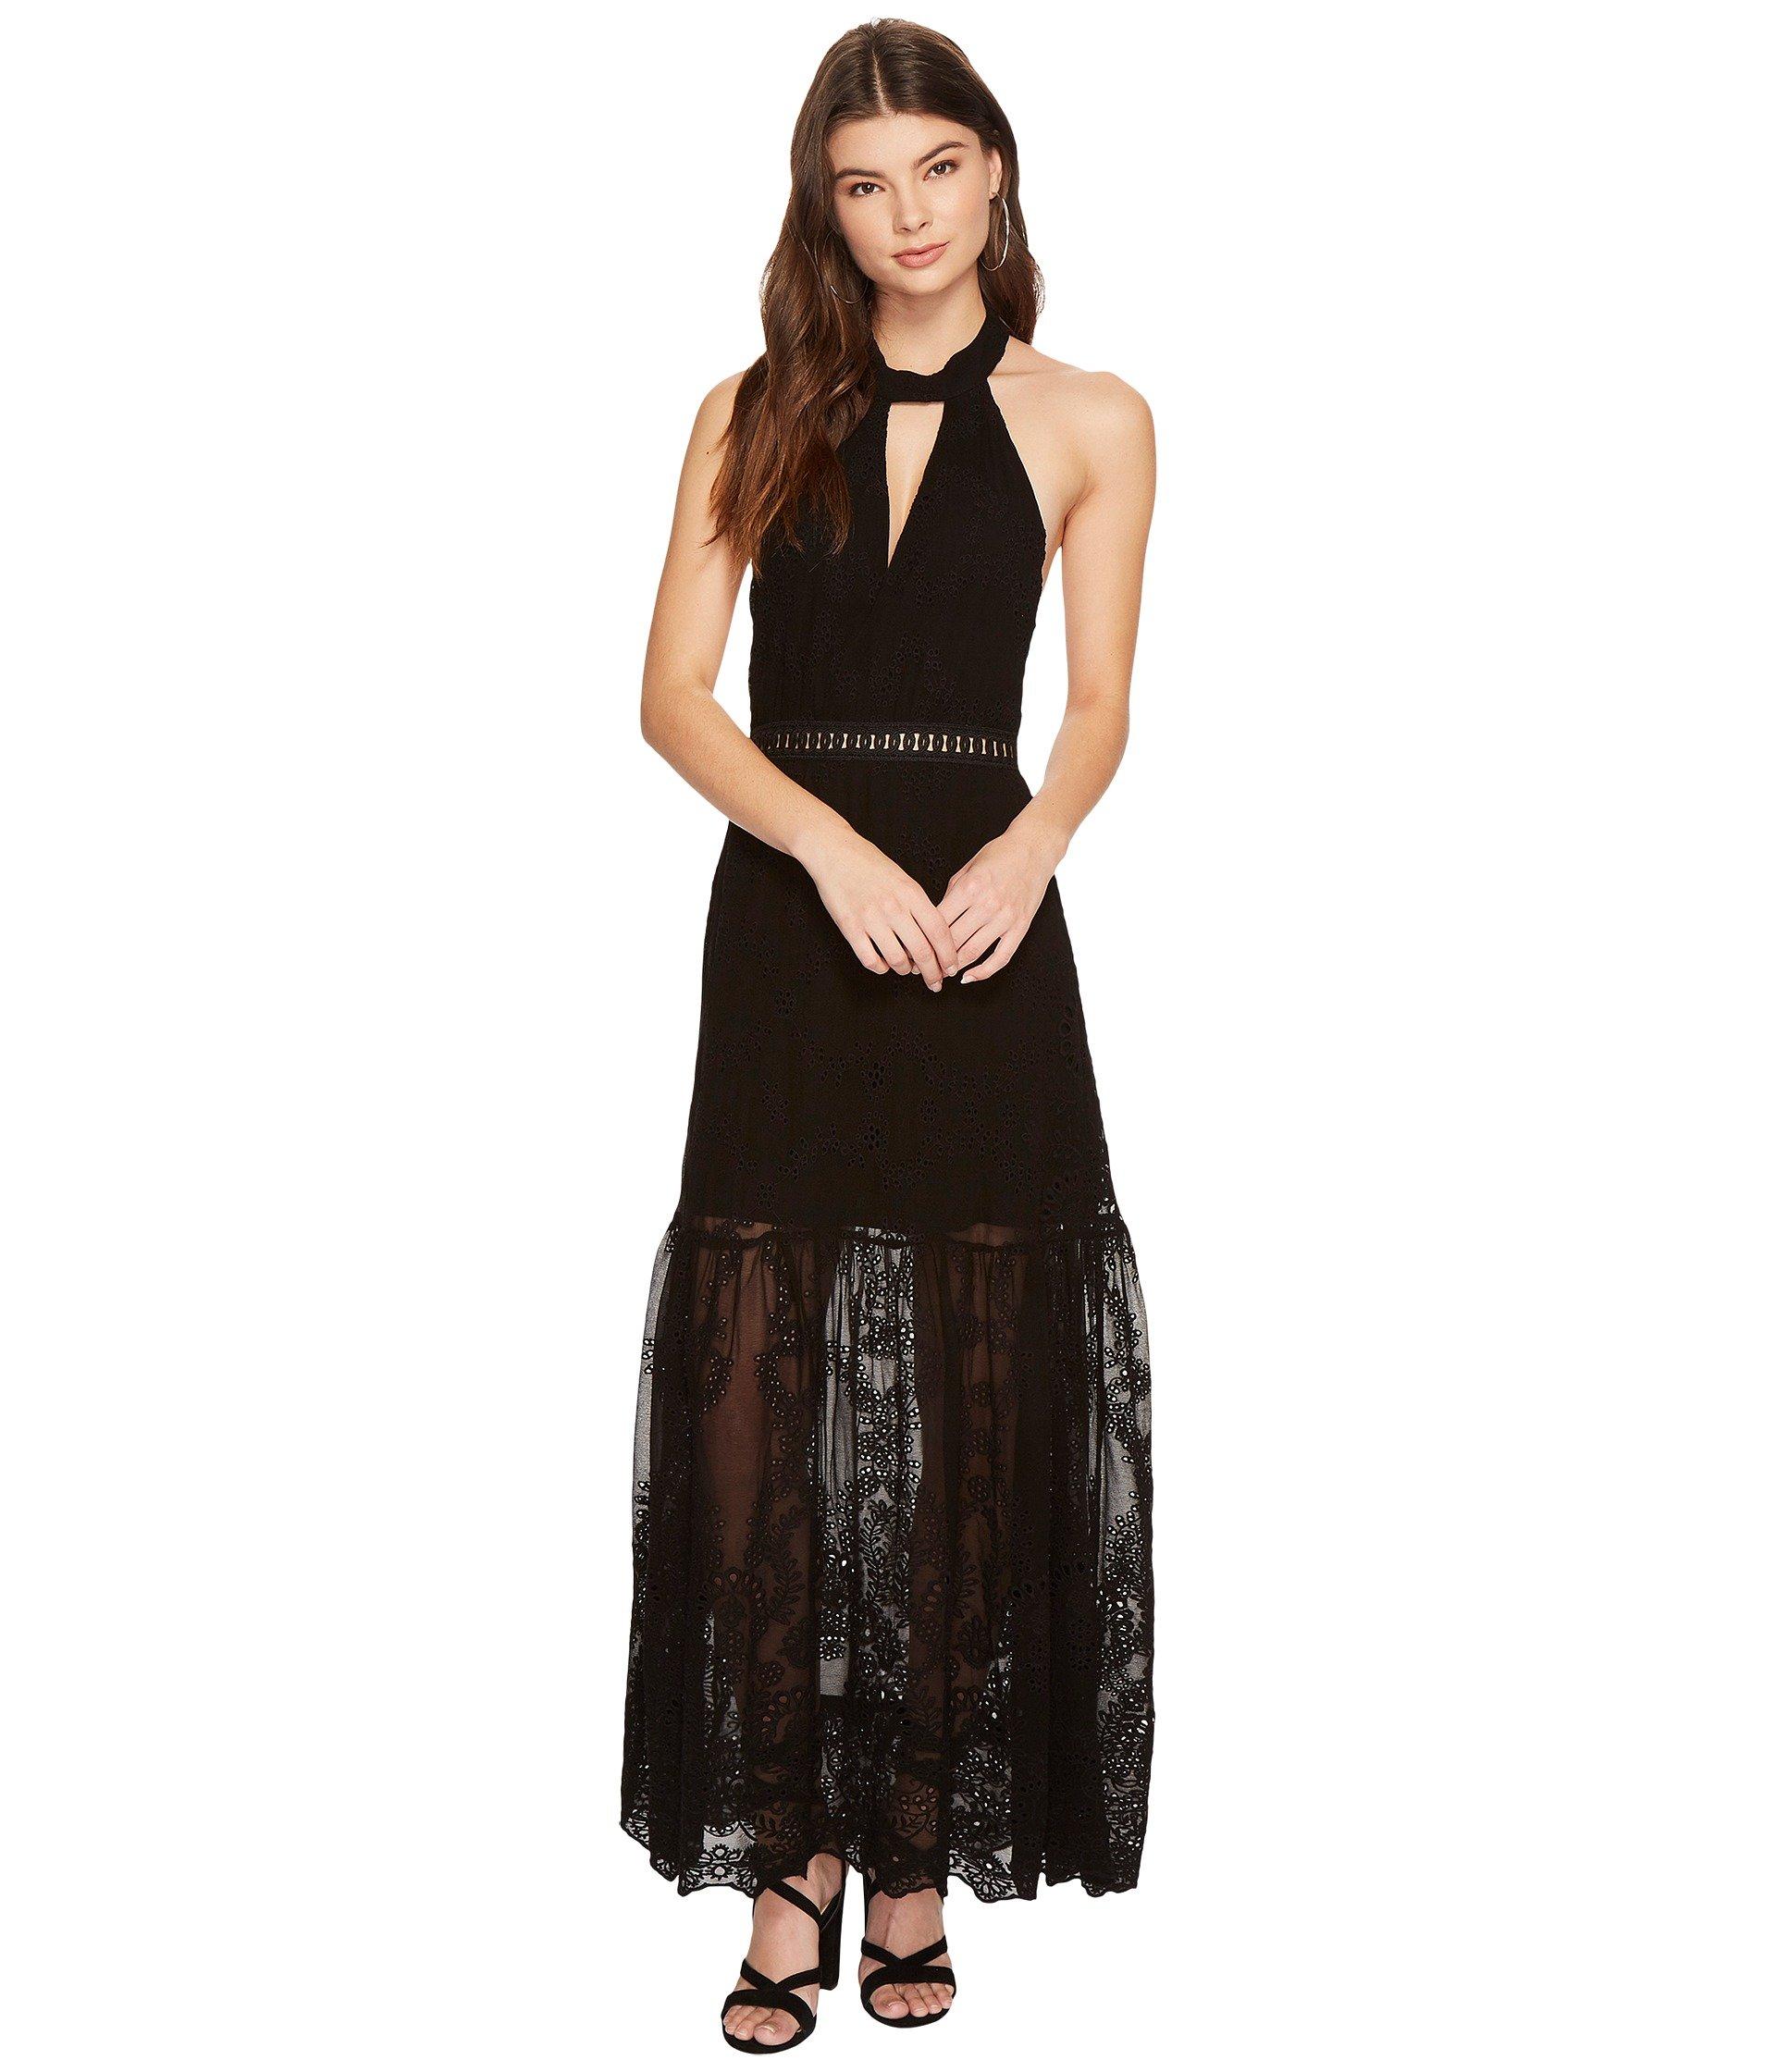 JEN'S PIRATE BOOTY Eyelet Queensland Choker Maxi Dress, Black Eyelet